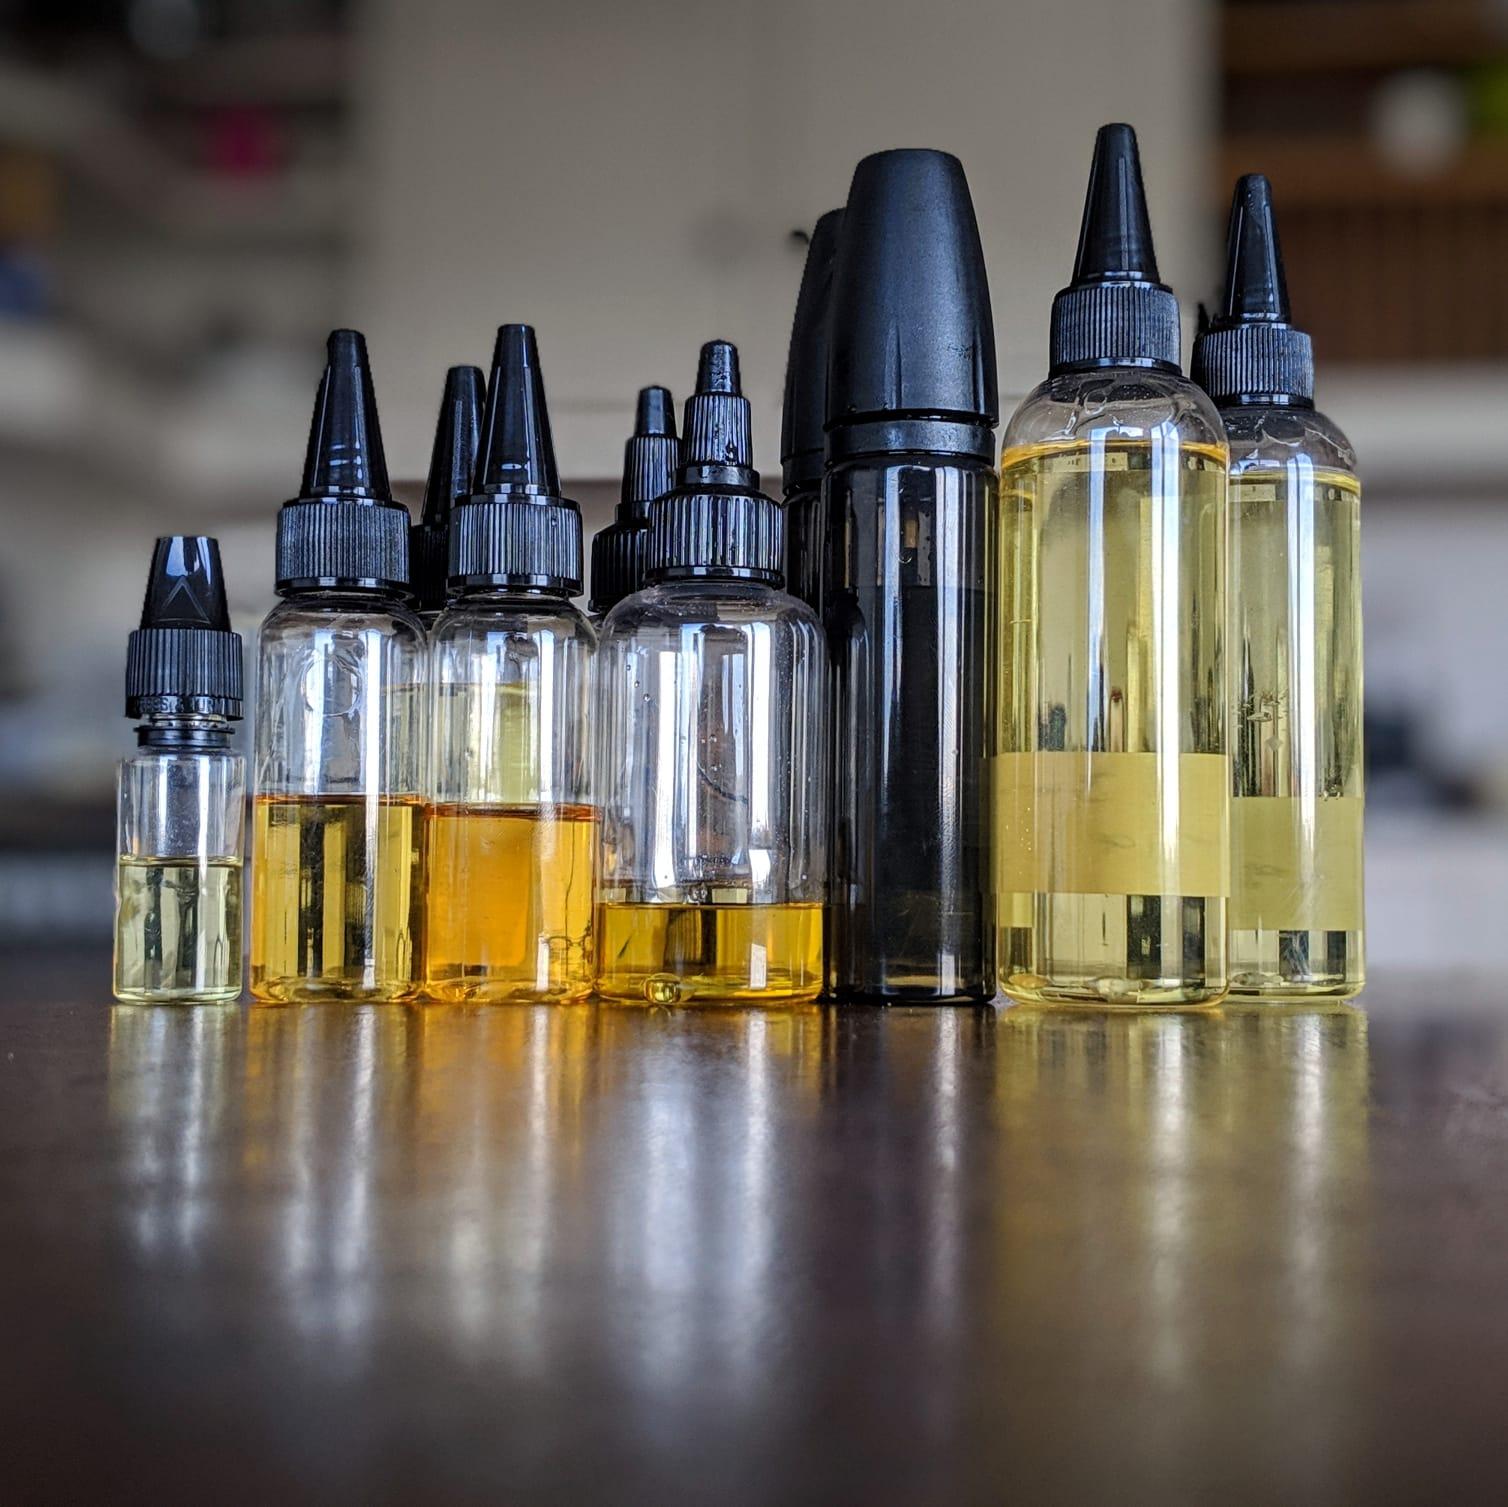 diy e-liquid bottles filled with flavoured vape liquid